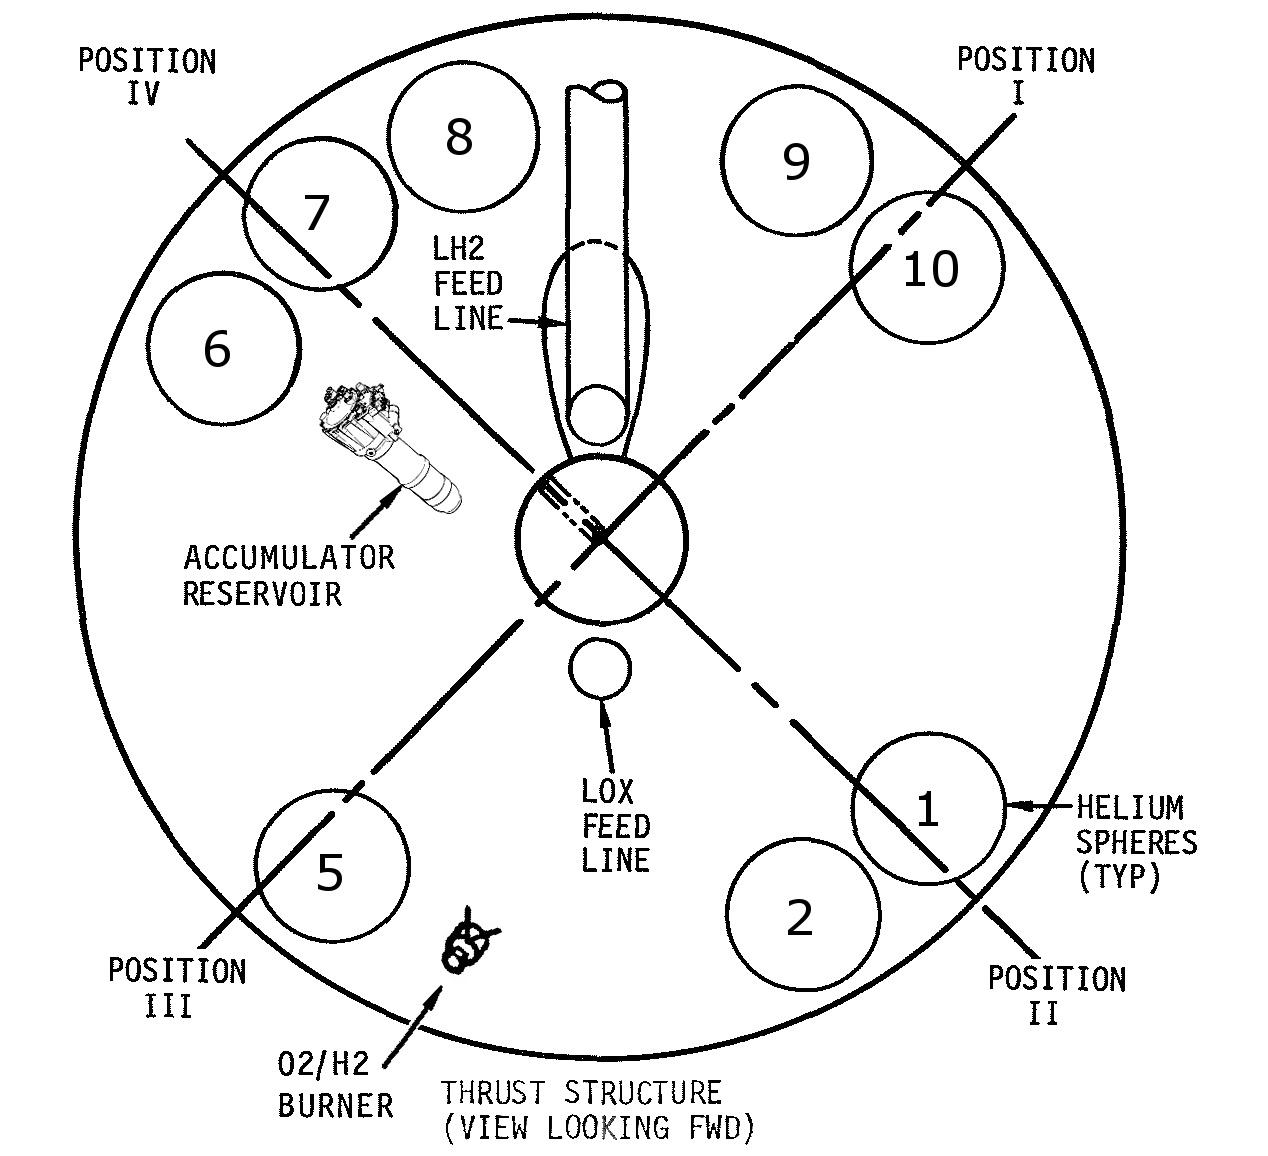 1268x1156 S Ivb (Saturn V) Propellant Tank Pressurization